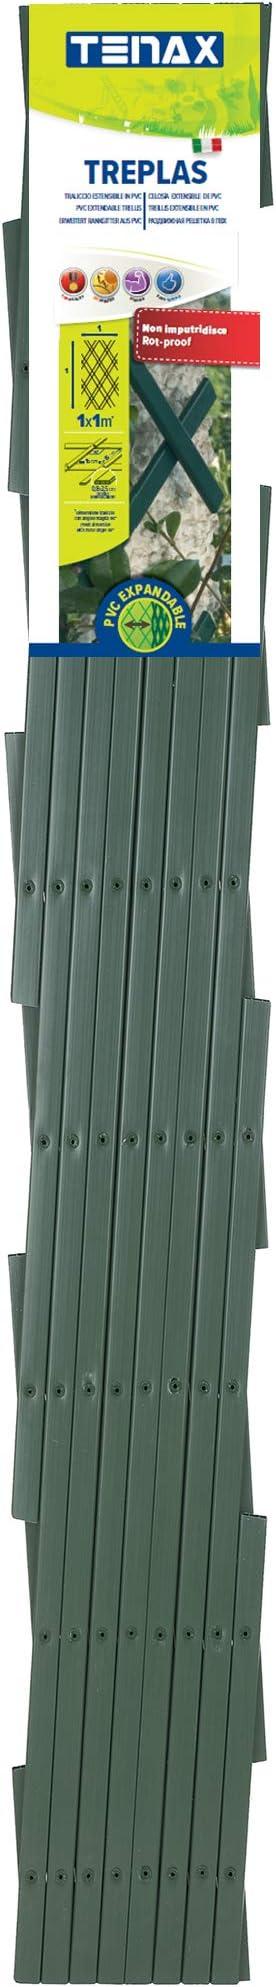 Trepls Rankgitter ausziehbar aus PVC 1,00x1 m gr/ün